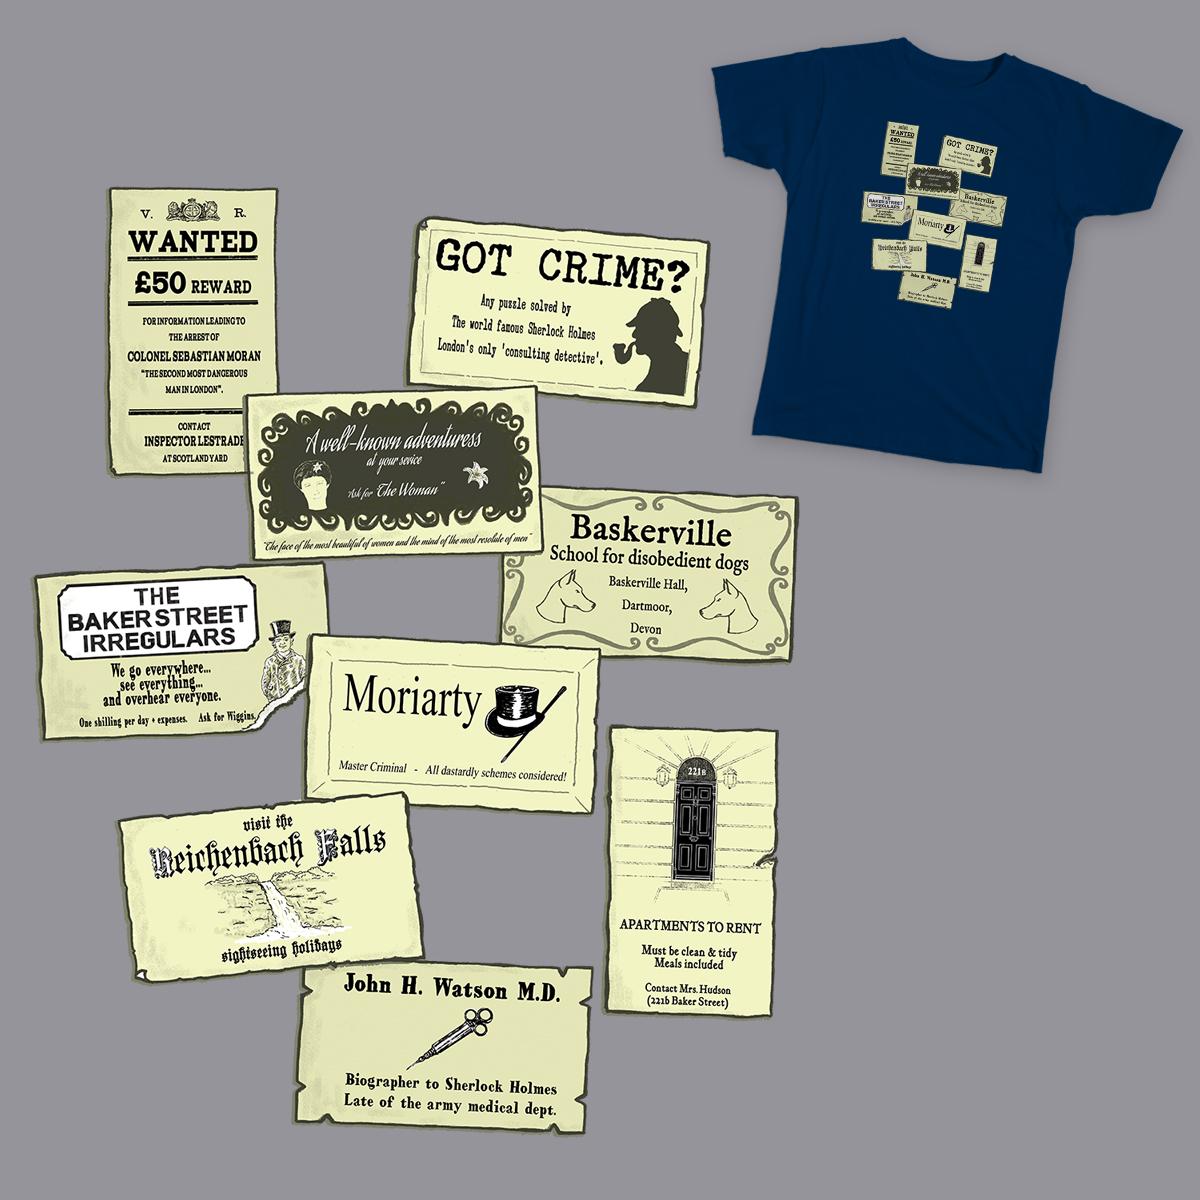 Victorian Calling Cards by Wonderlove on Threadless